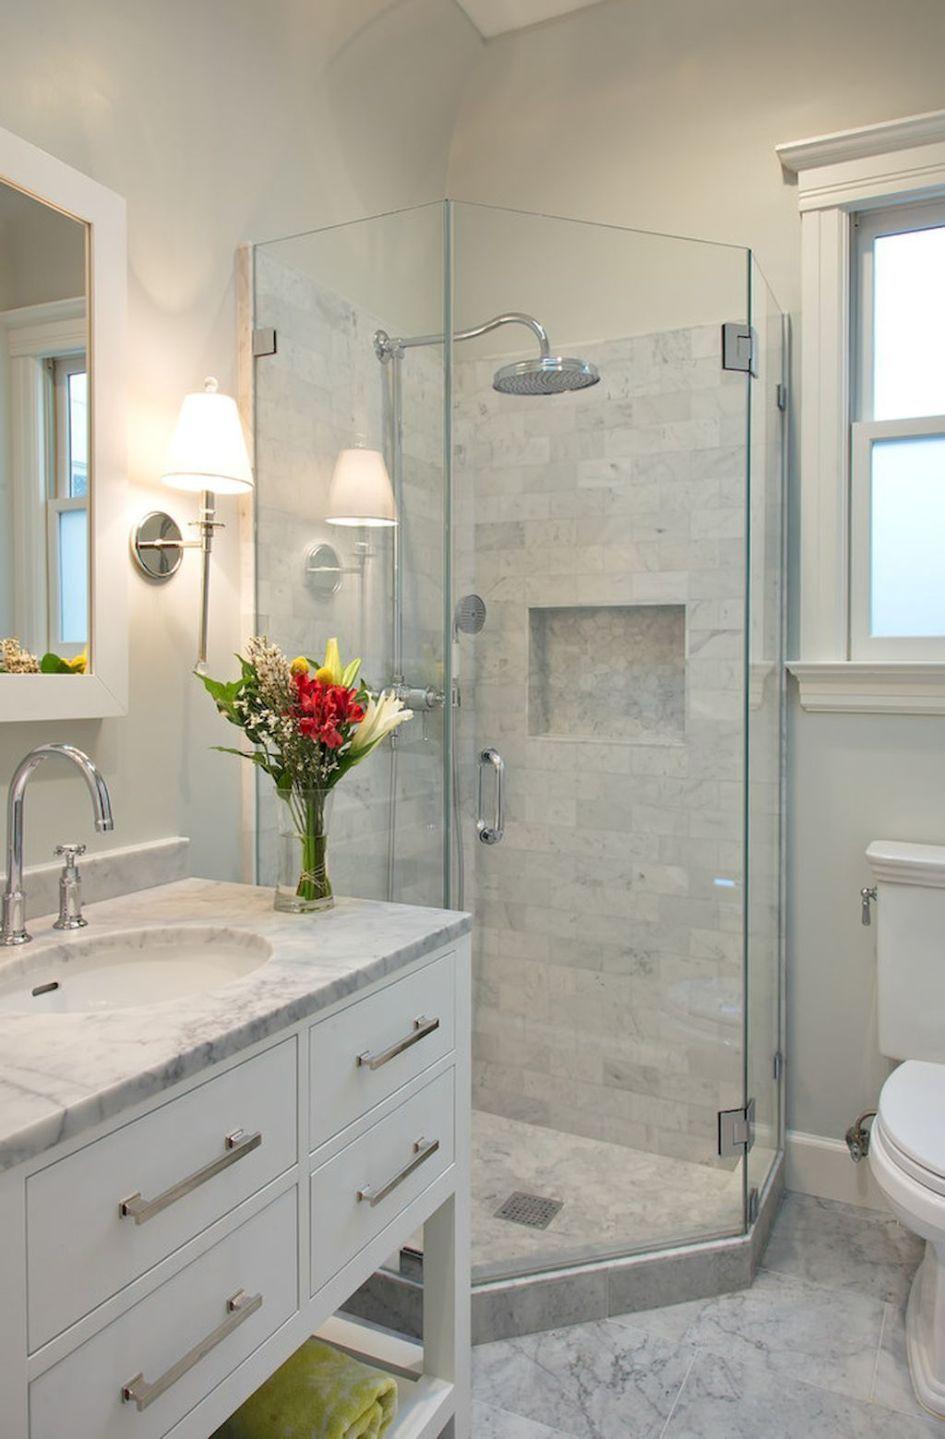 25 Awesome Small Bathroom Remodel Ideas  Decor  Pinterest Amazing Remodeling Ideas For Small Bathrooms Design Inspiration